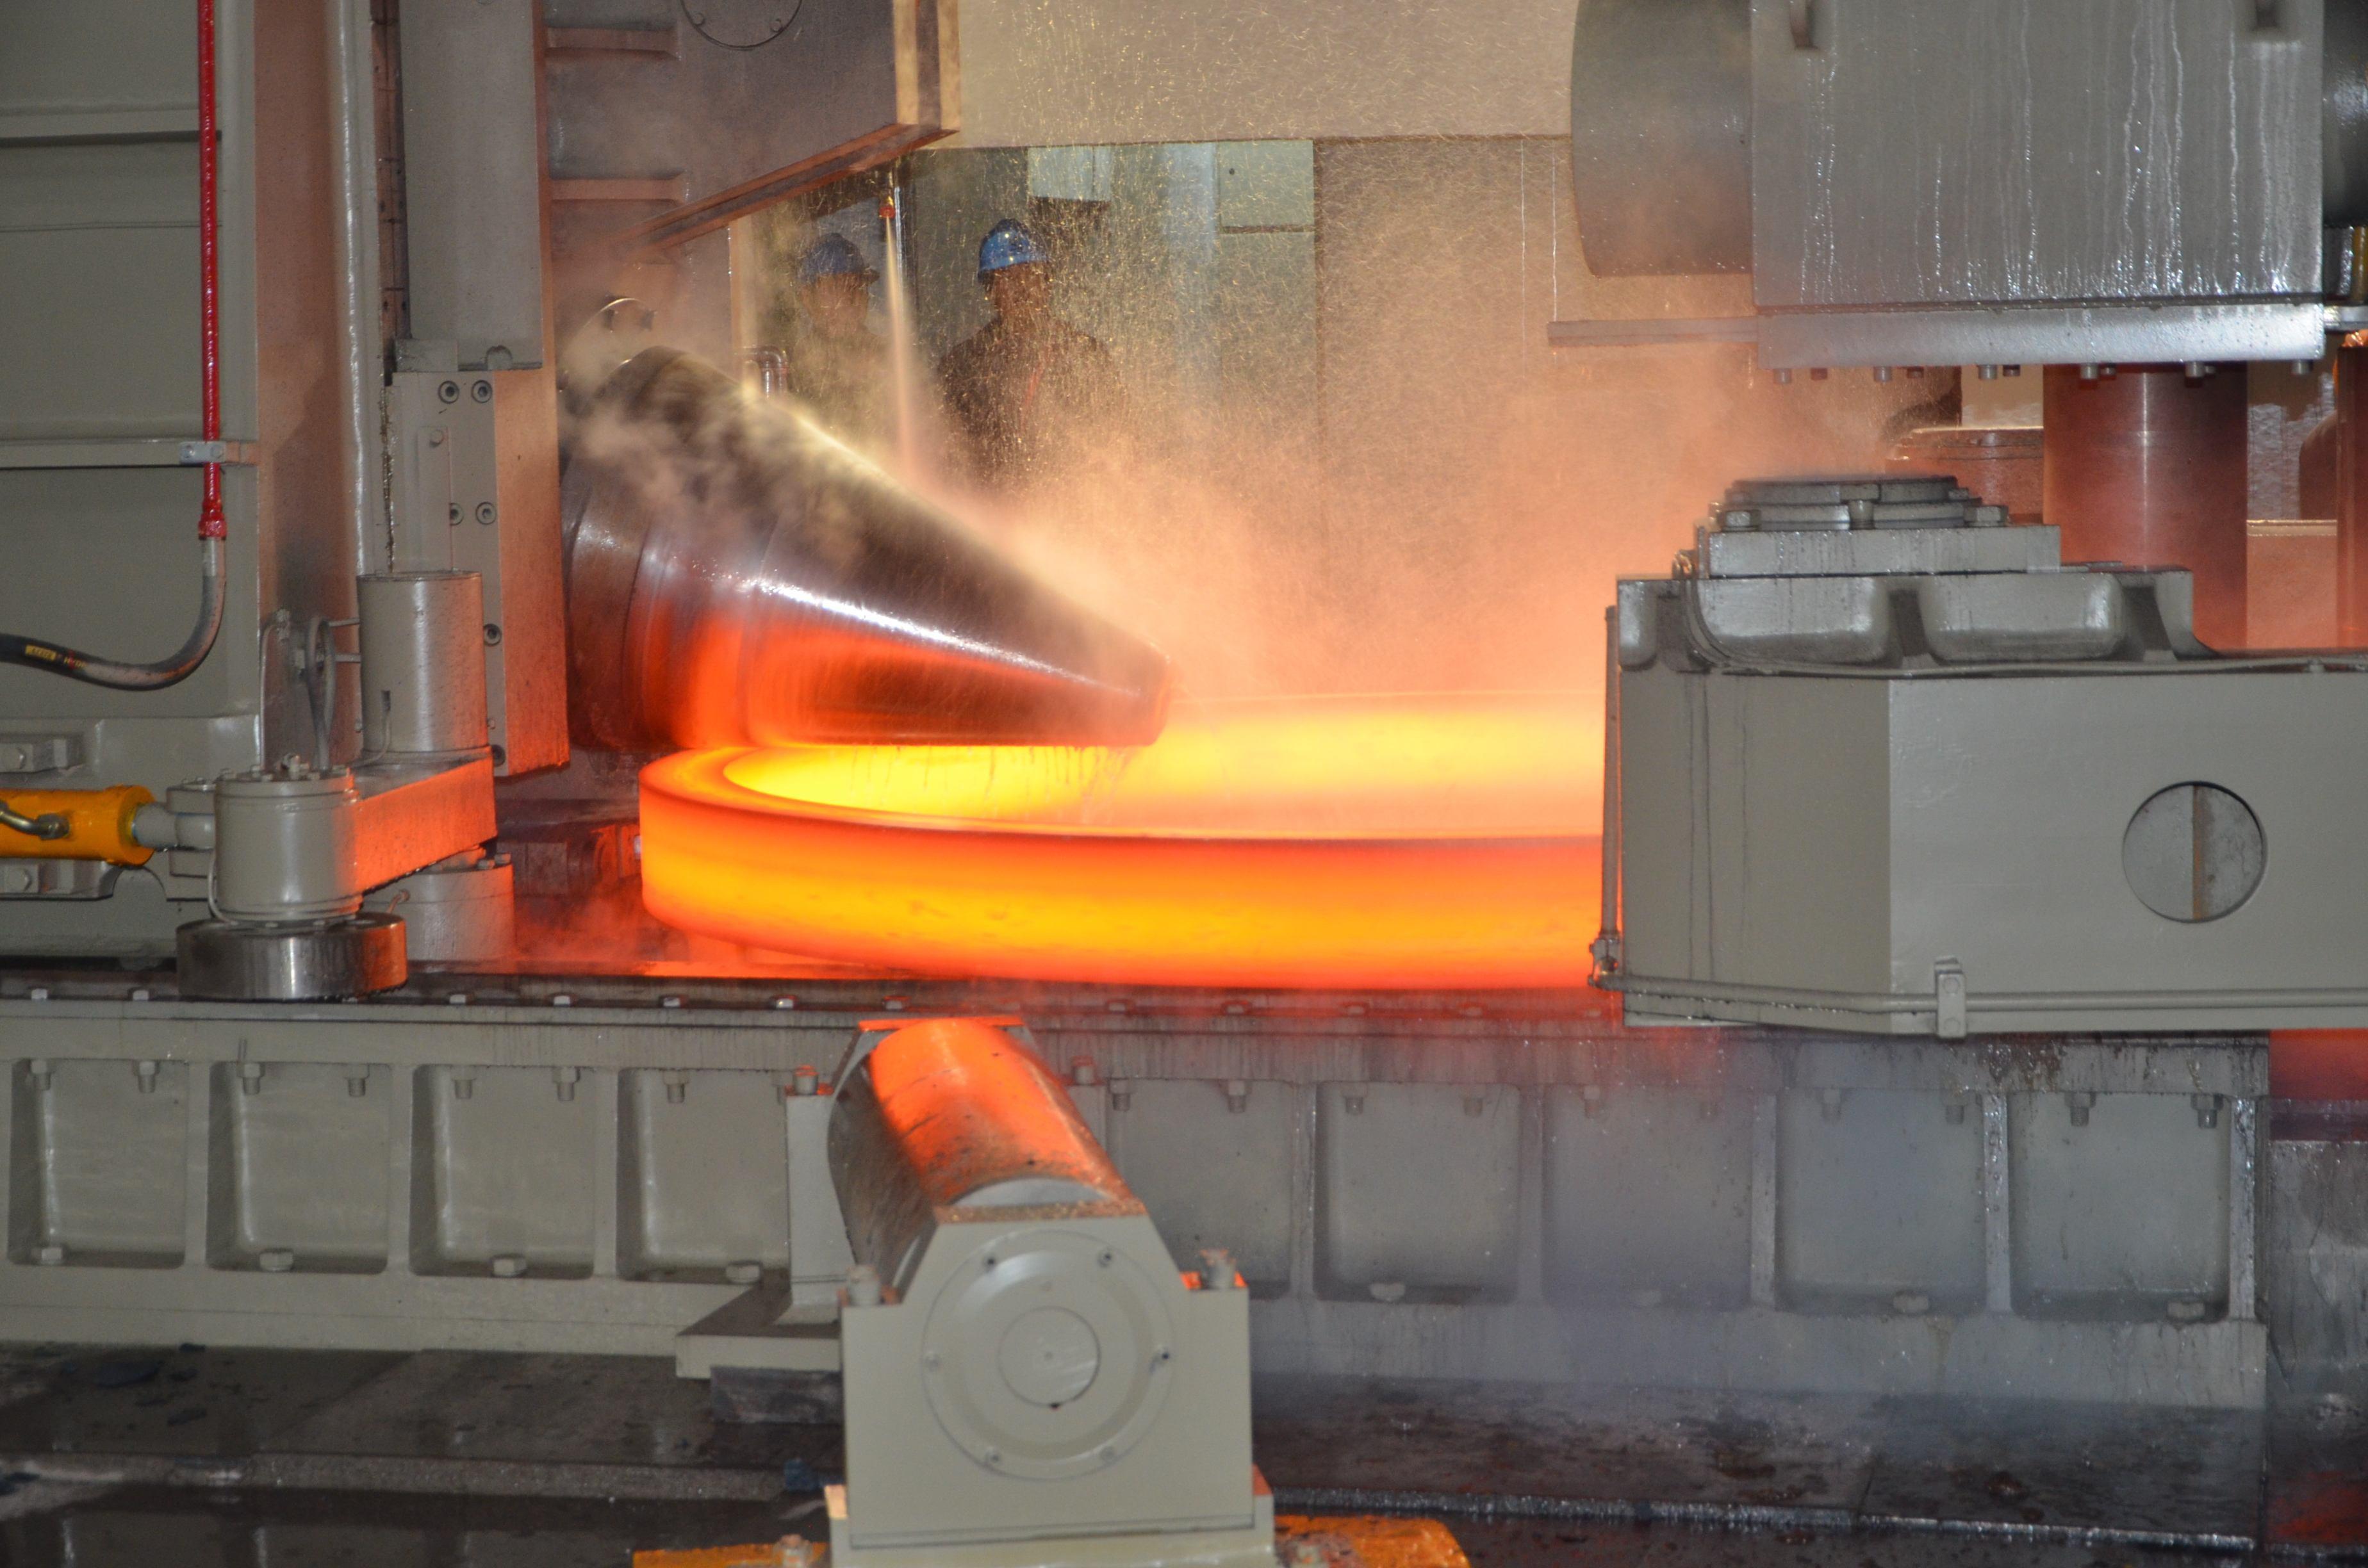 OEM pipeline product